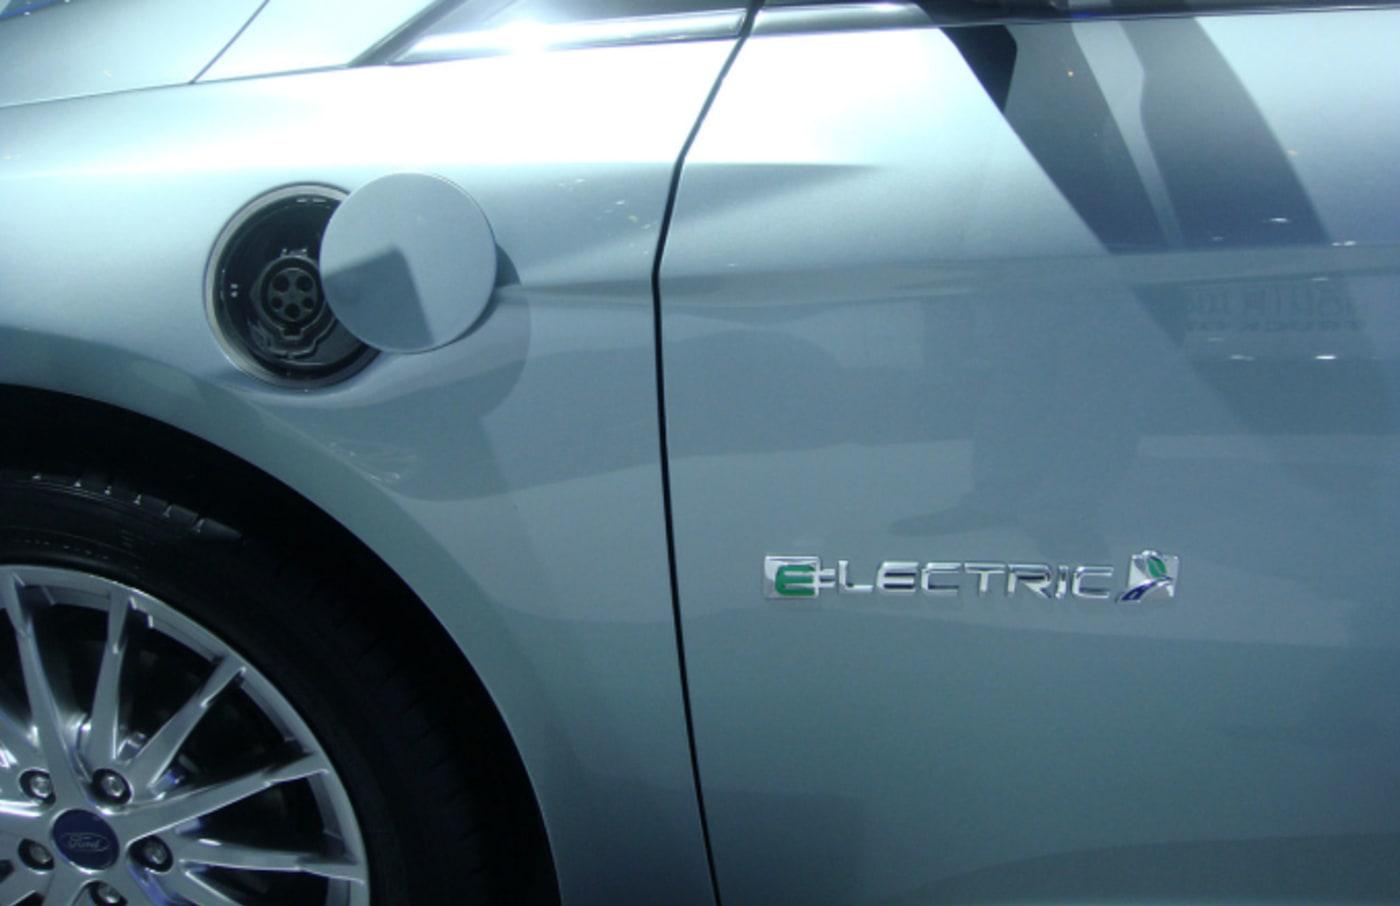 Ford Electric Car Close Up via Mario Roberto Duran Ortiz